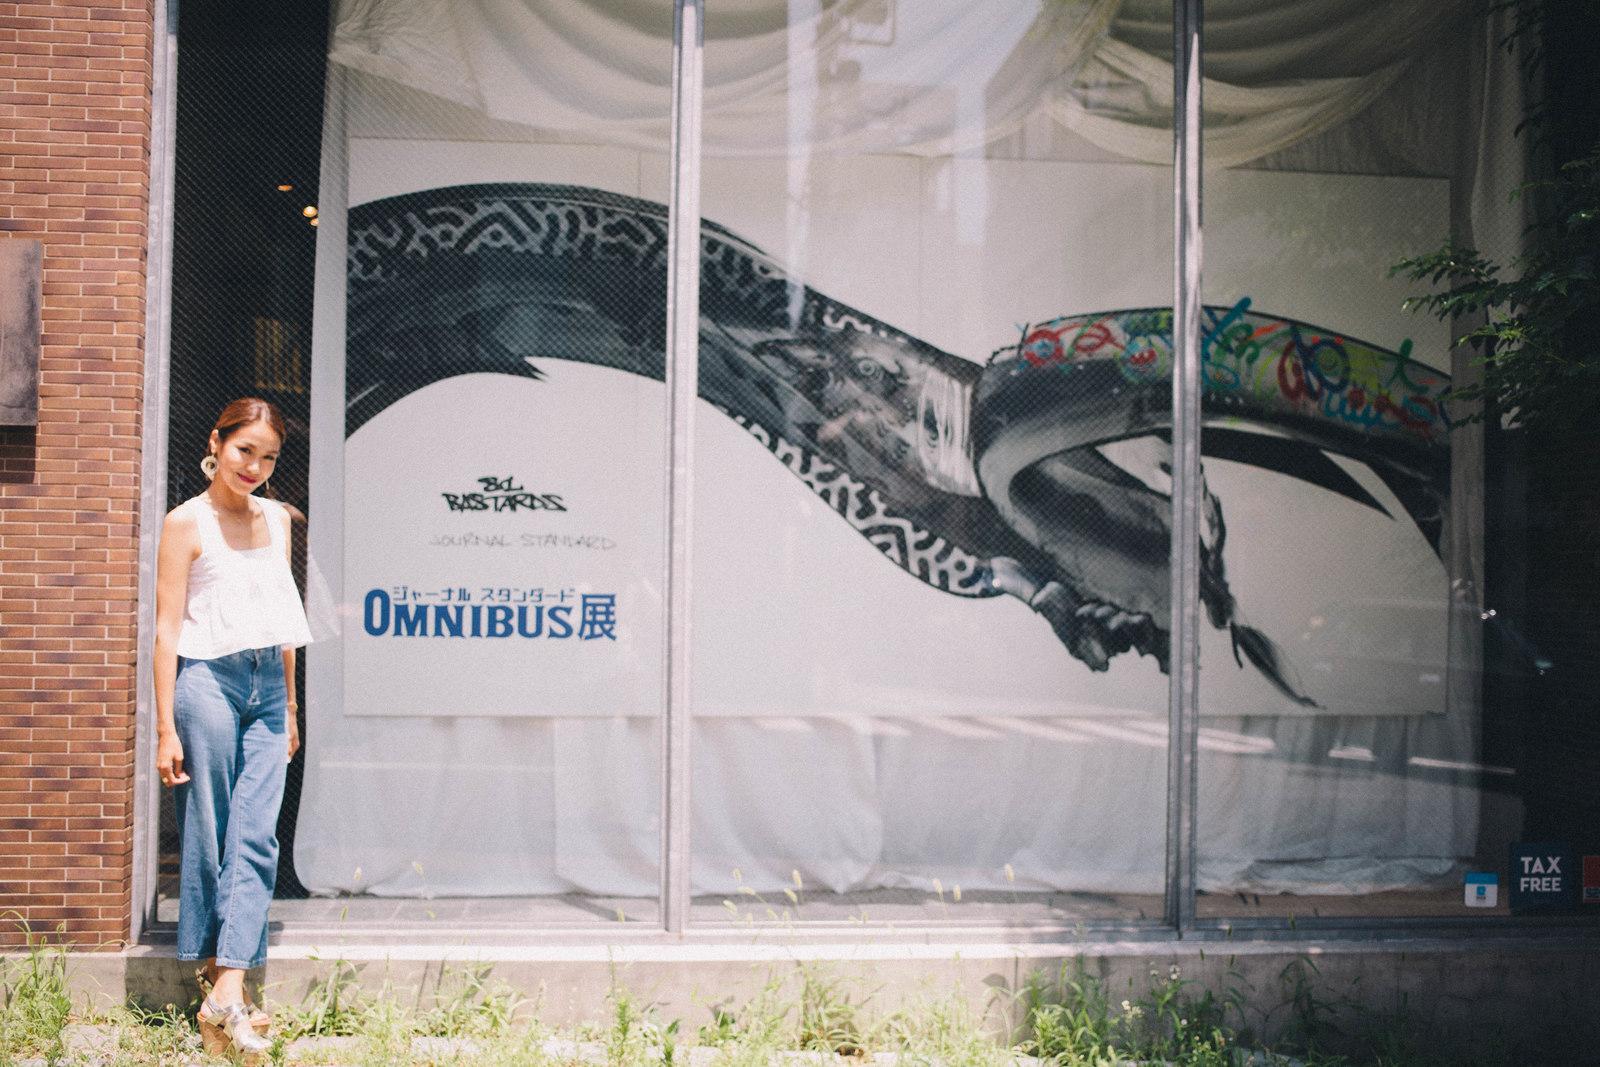 IMG_1482 国内外で活躍するアーティスト4組の「作品の向こう側」| ジャーナル スタンダード「オムニバス展」密着レポート!